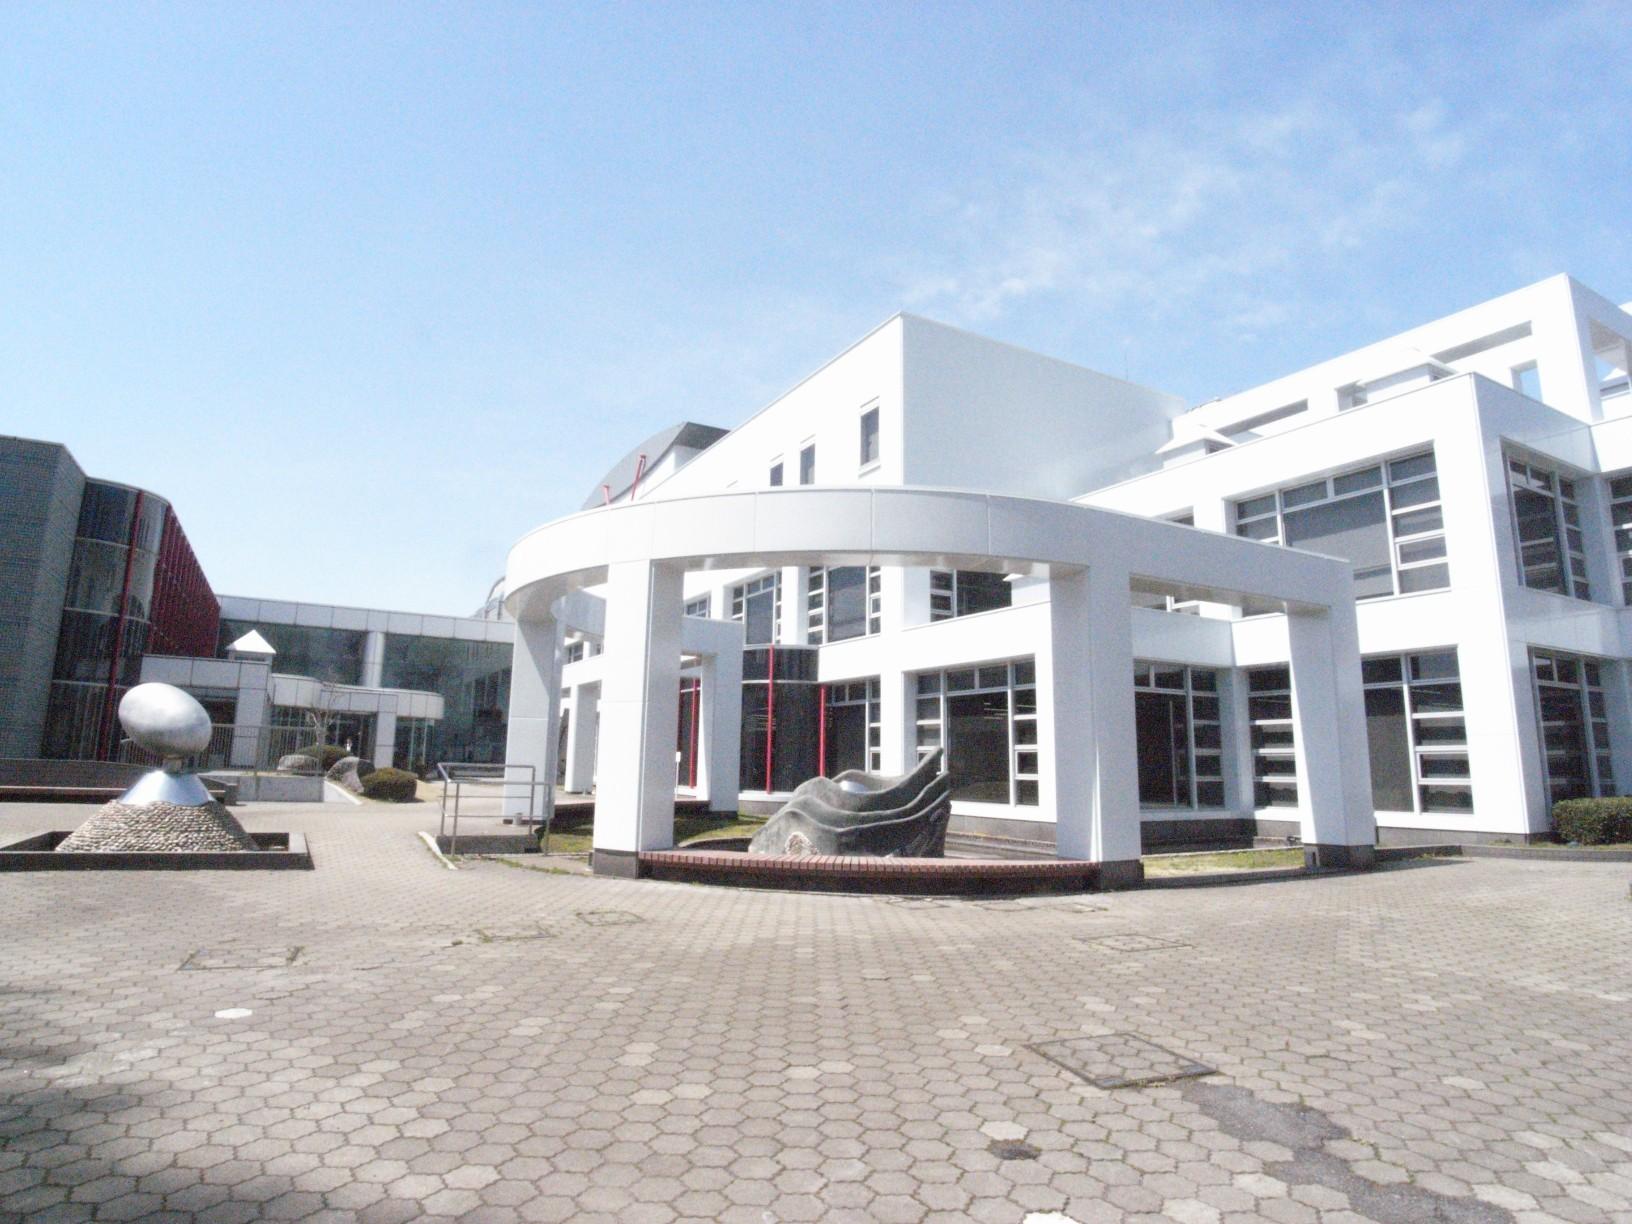 図書館 宇都宮市立東図書館(図書館)まで260m